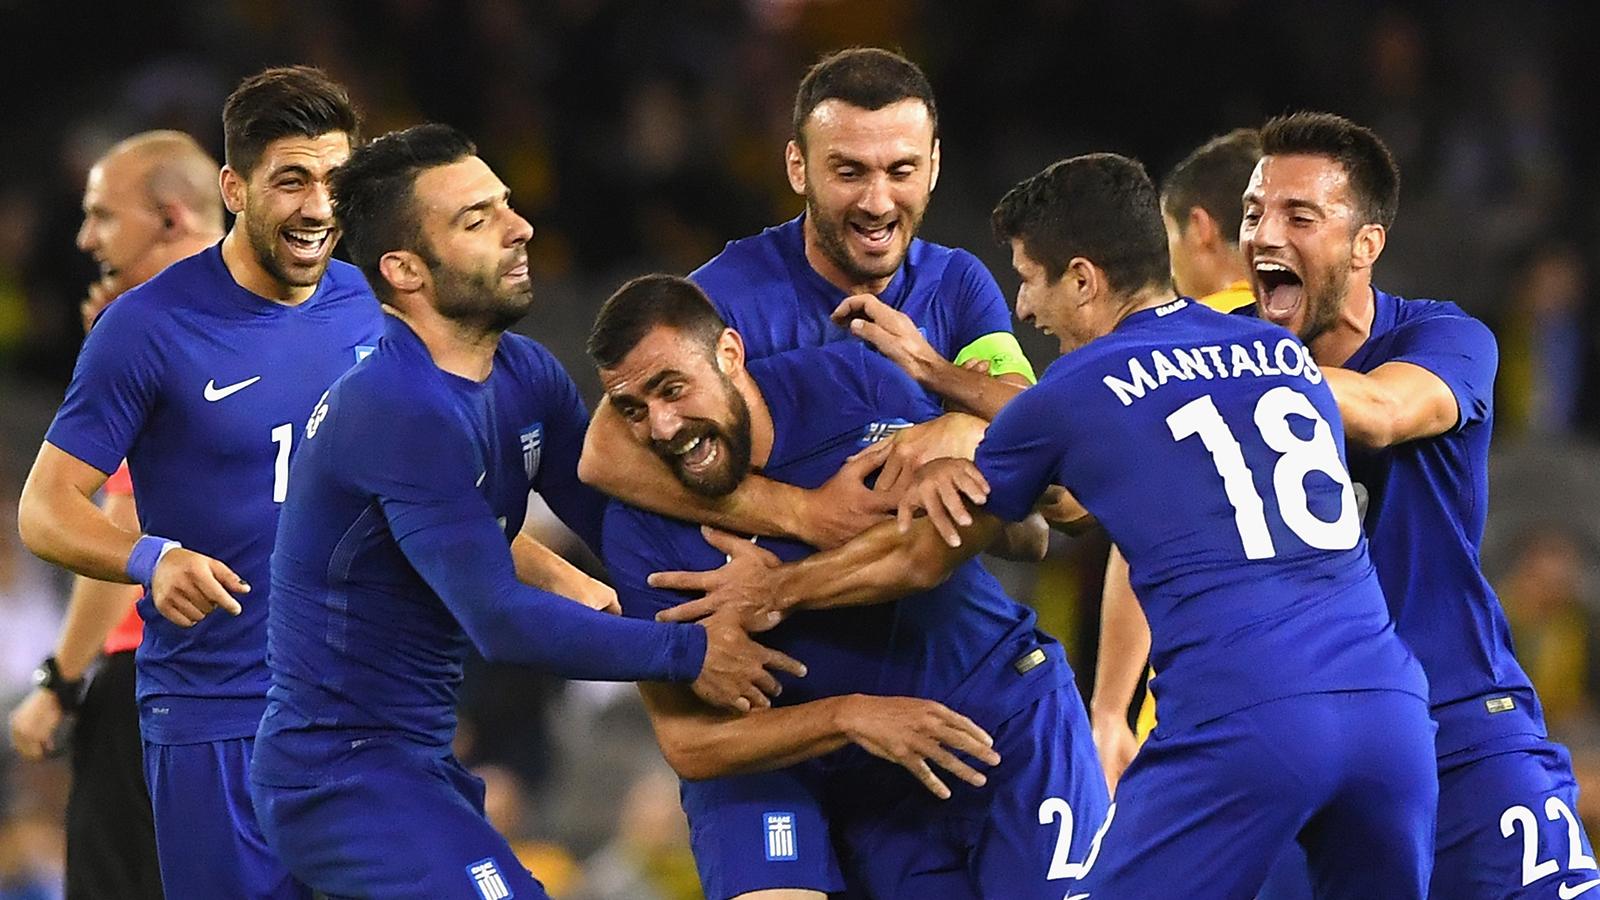 Greece's Maniatis scores vs. Australia from inside his own half